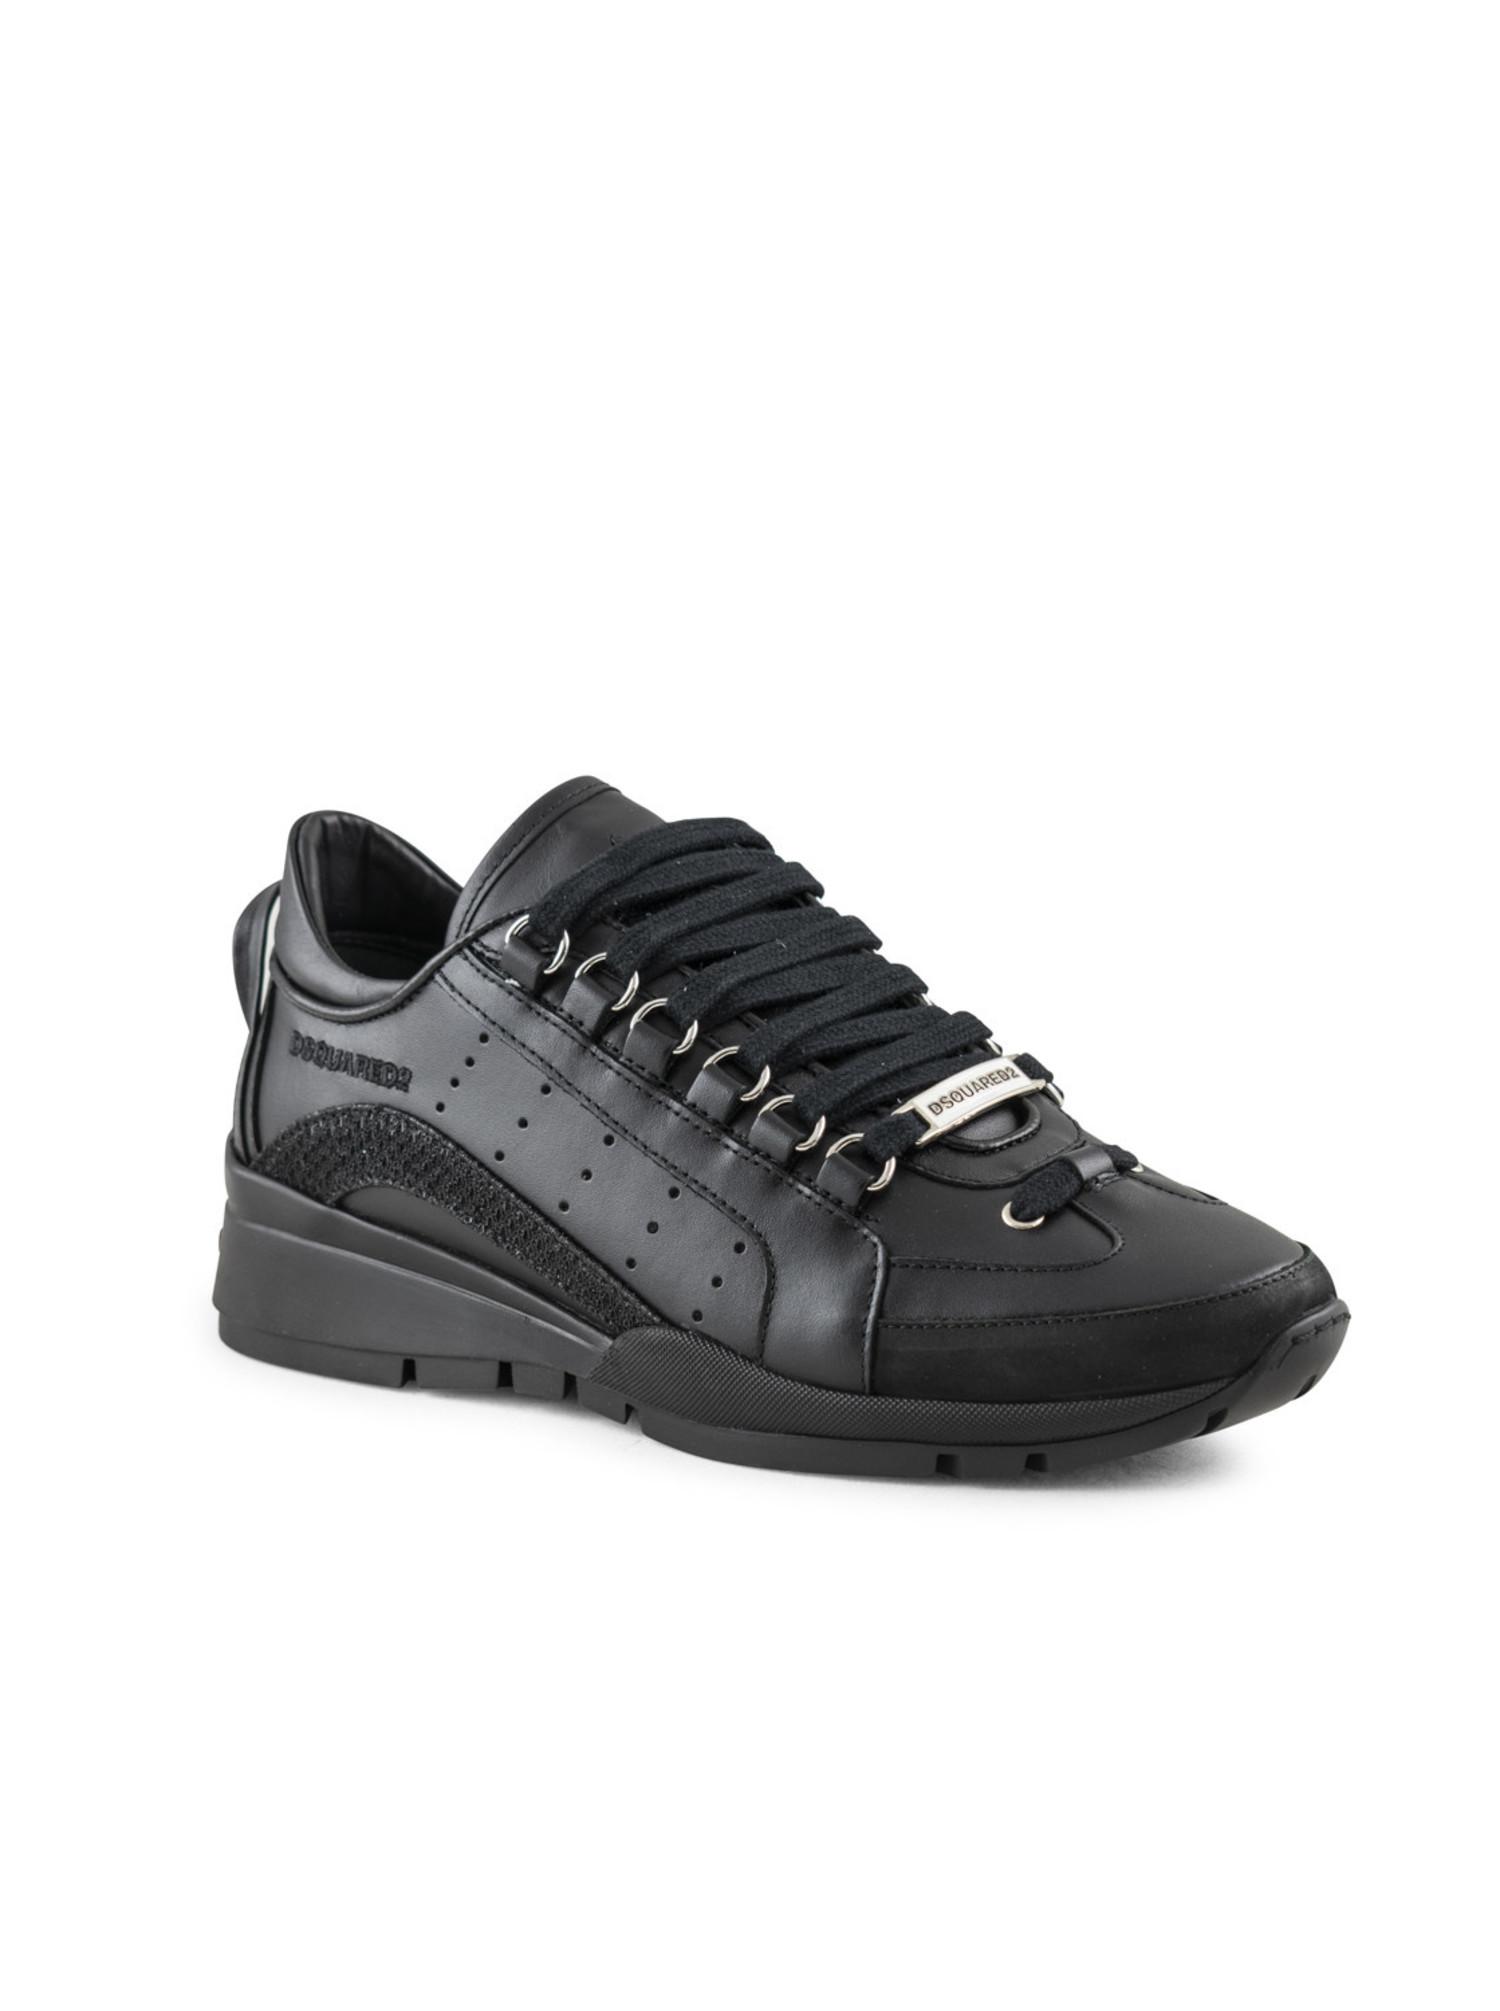 Dsquared2 sneaker 551 dames - Dresscode